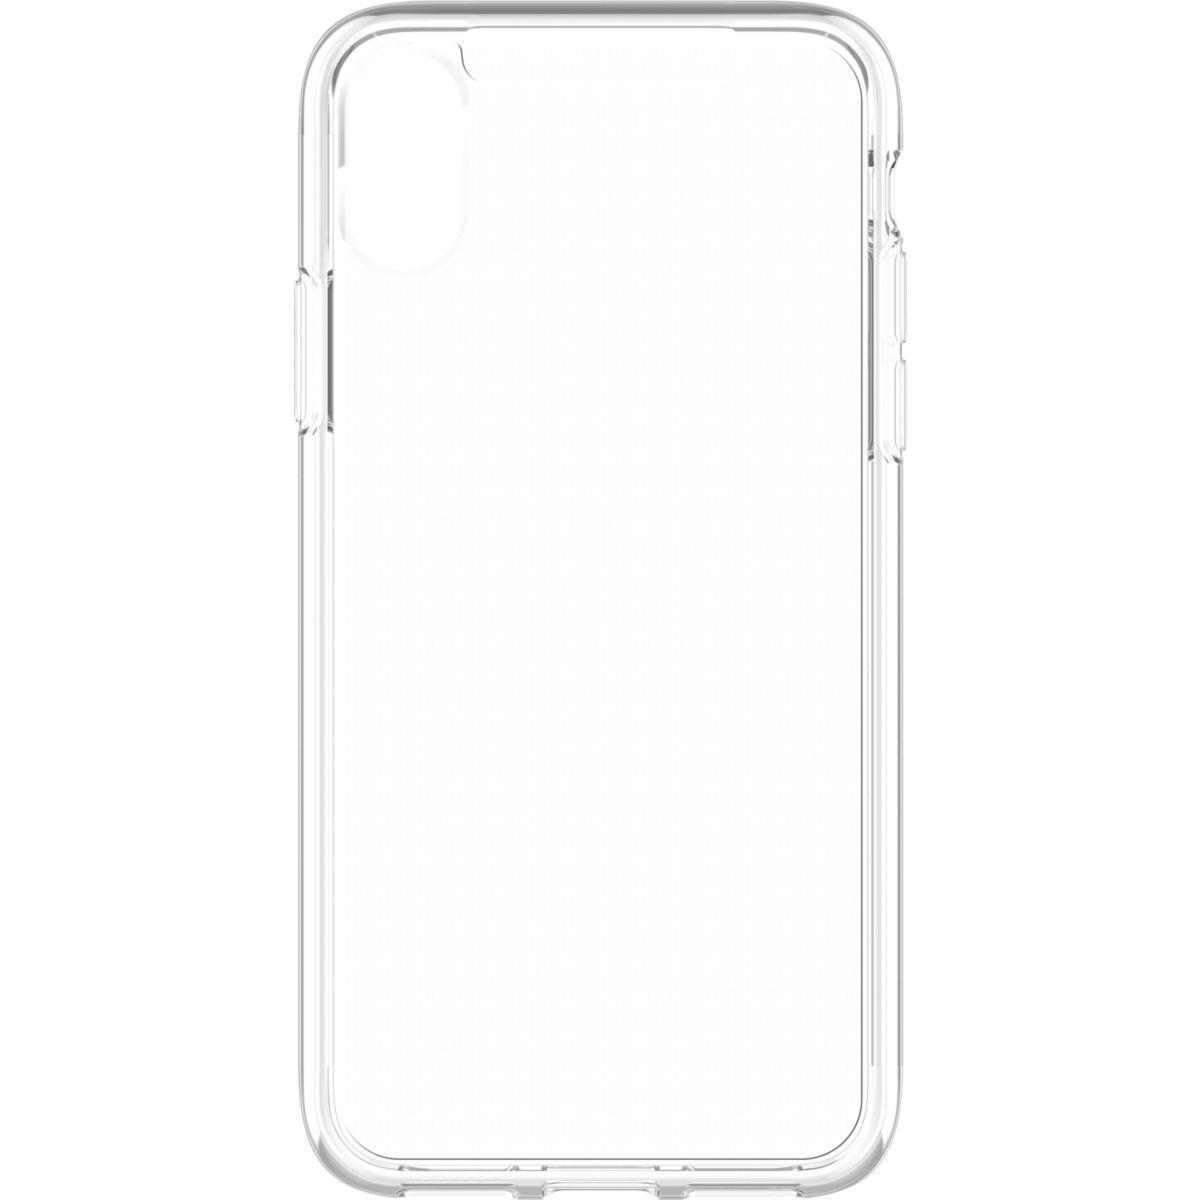 Coque + prot�ge �cran otterbox iphone x pack skin + verre tremp� - livraison offerte : code liv (photo)